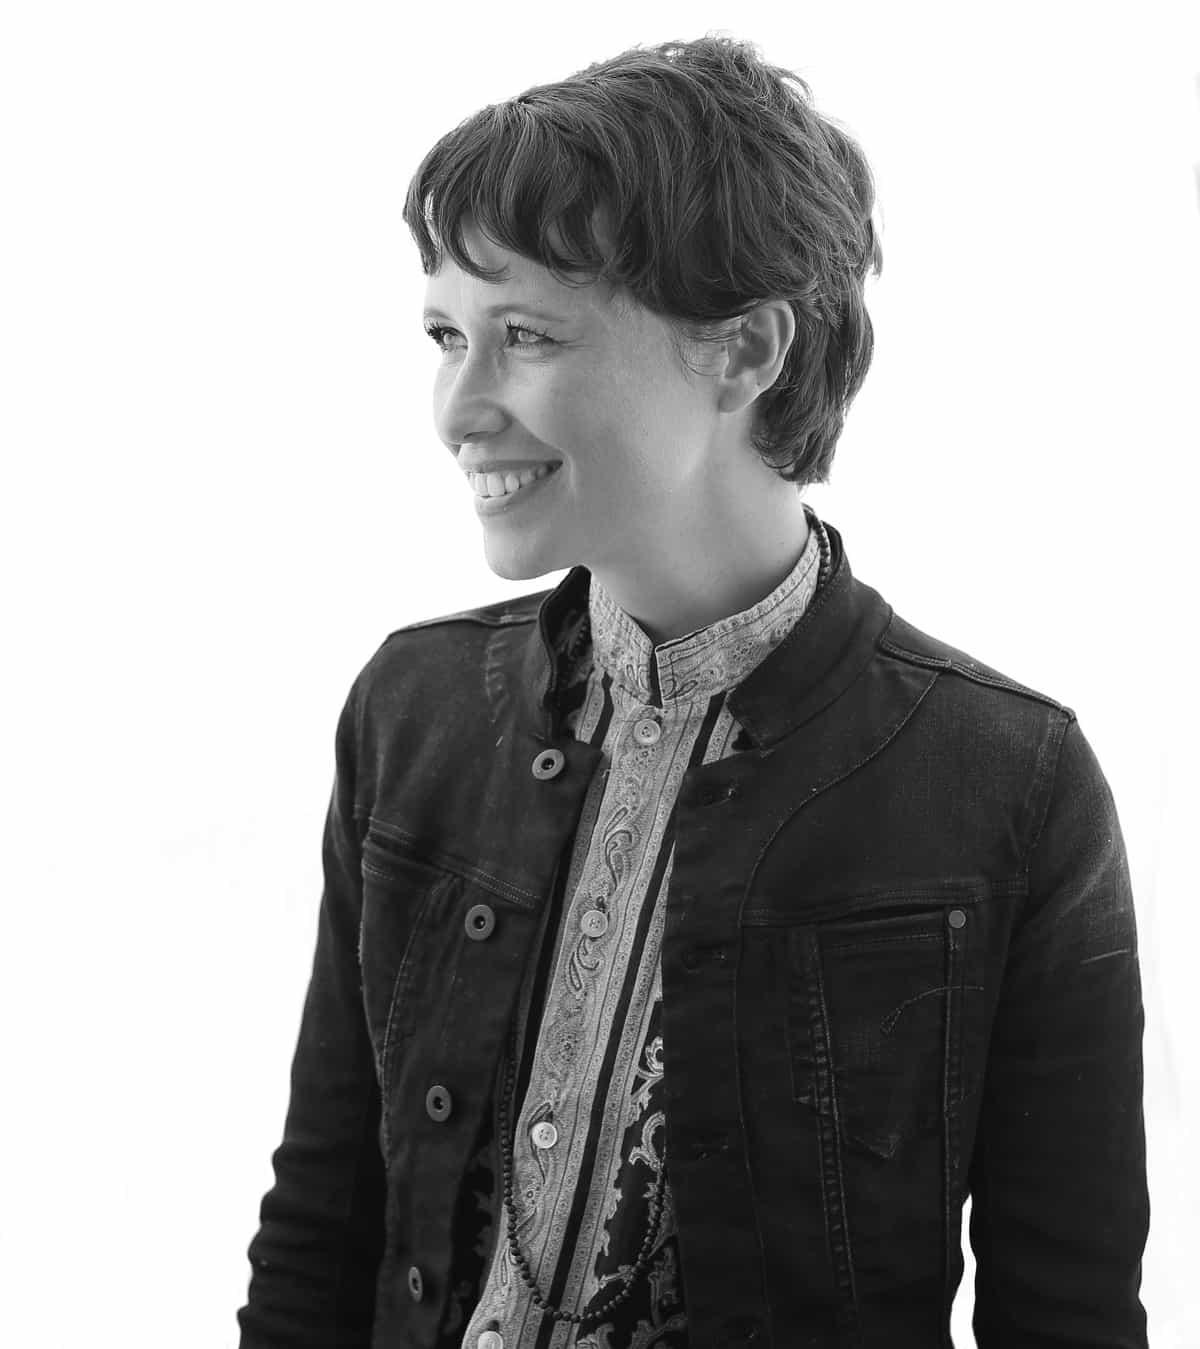 Sarah Lee Guthrie, Northampton music, photo by Izzy Berdan